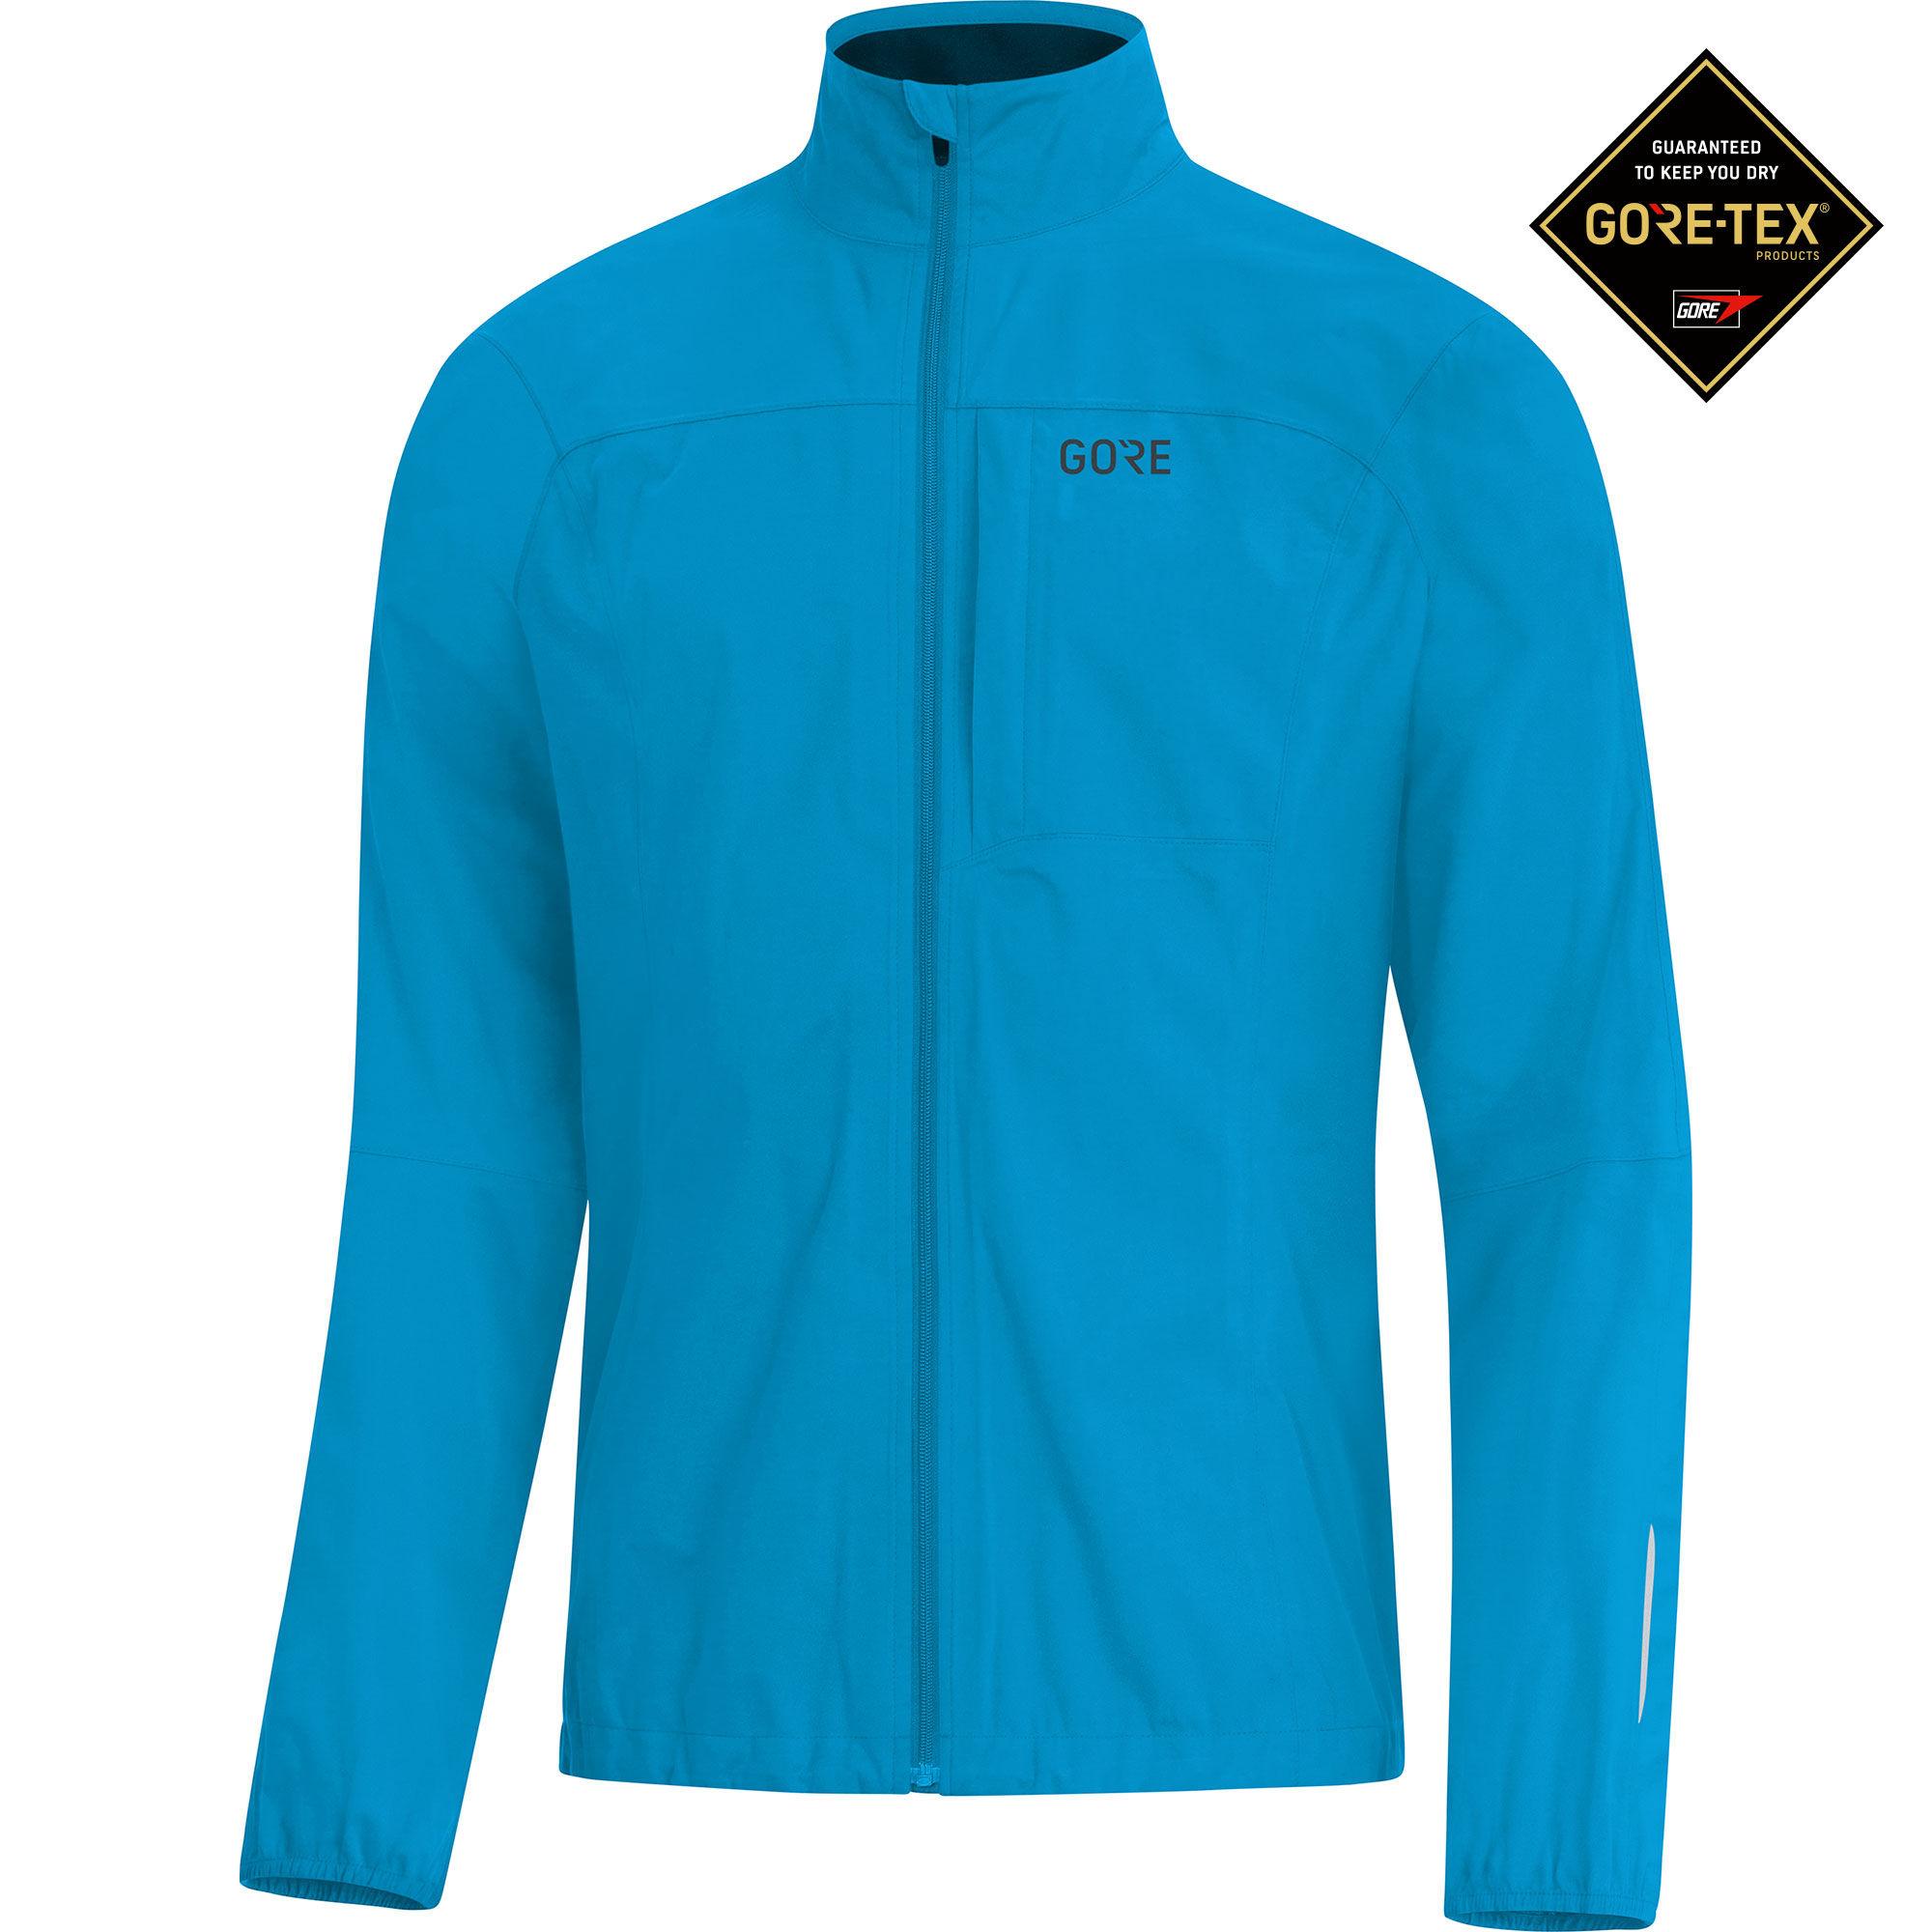 Gore R3 GTX Active Jacke in Blau